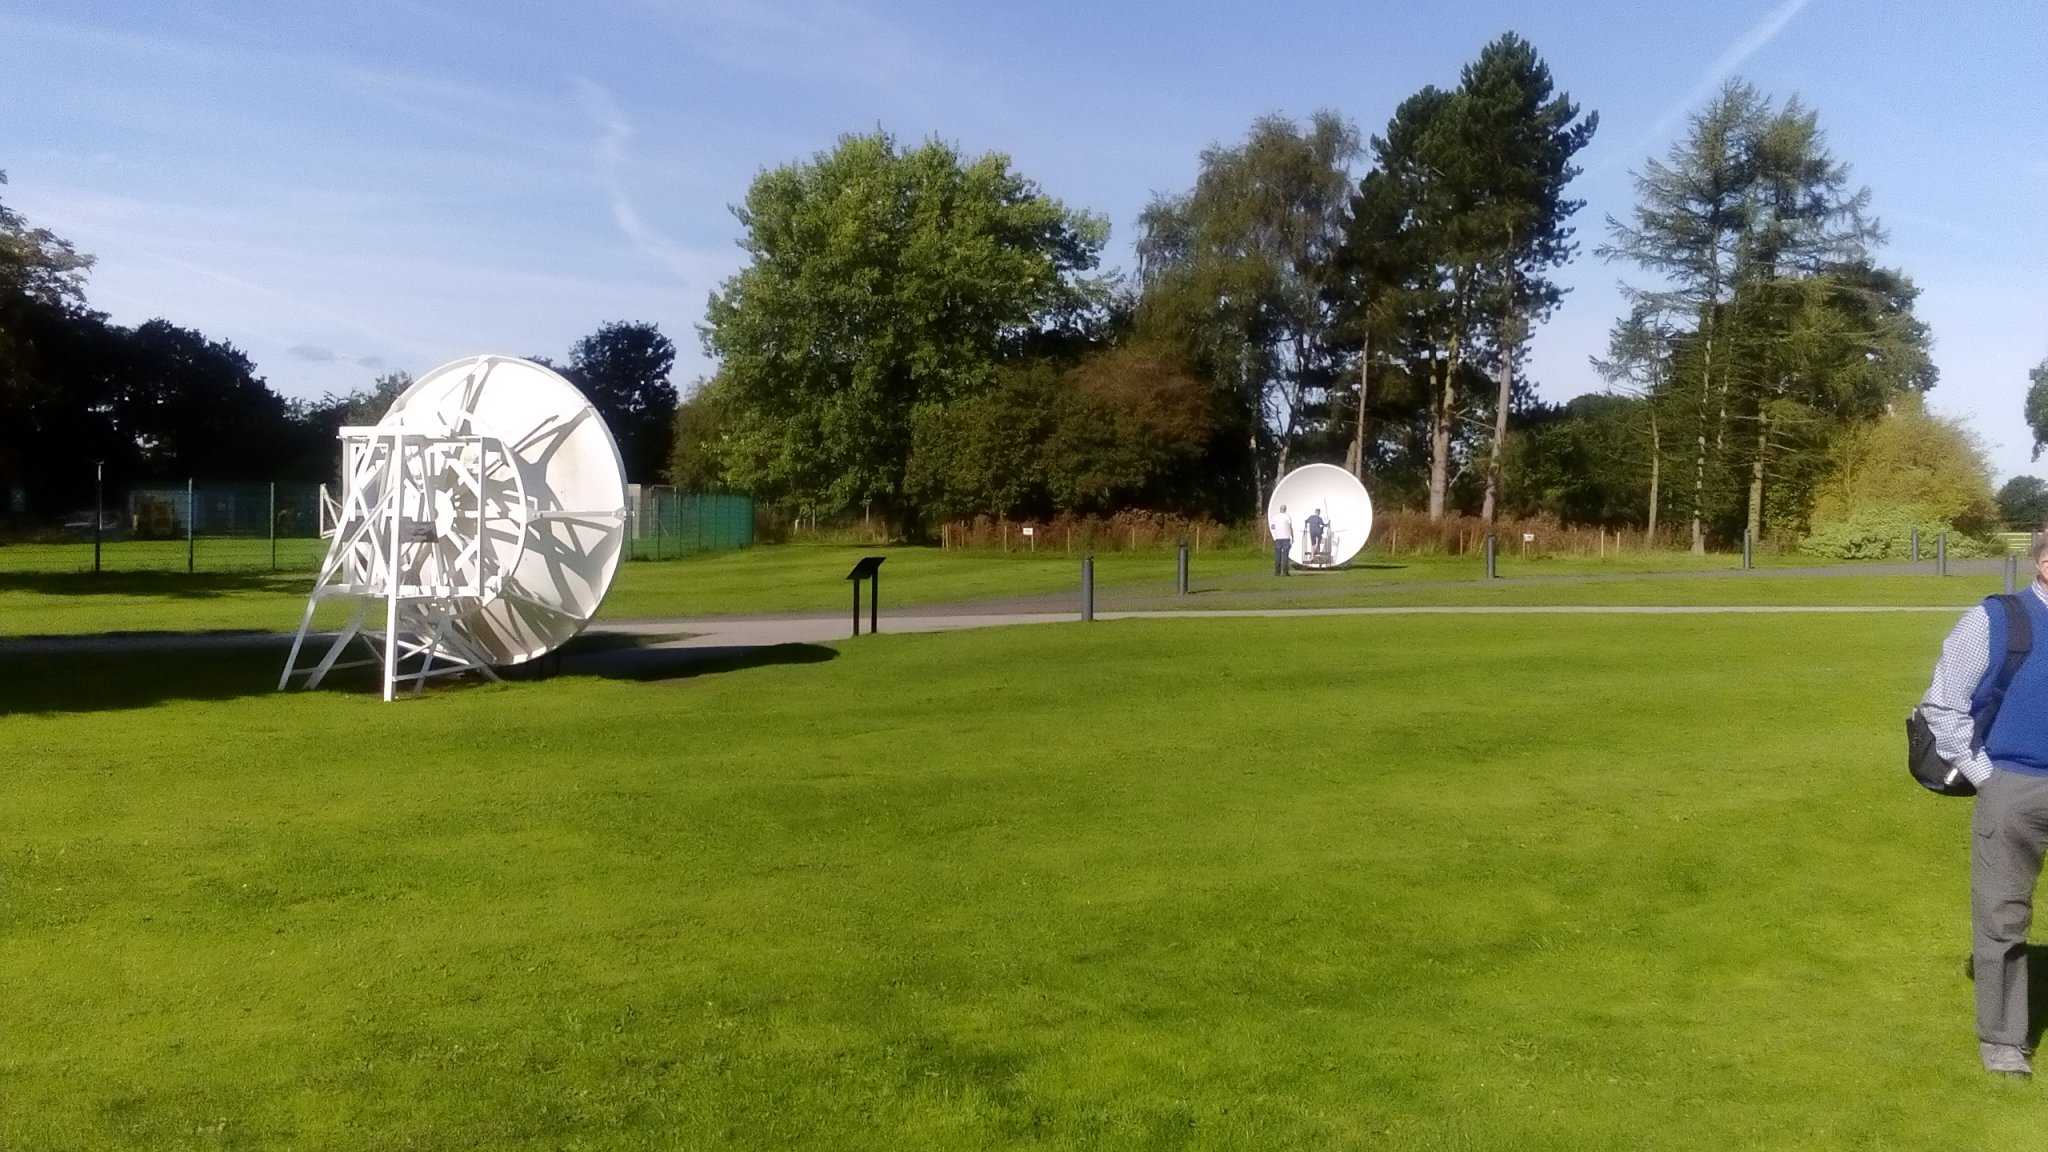 Sound radars